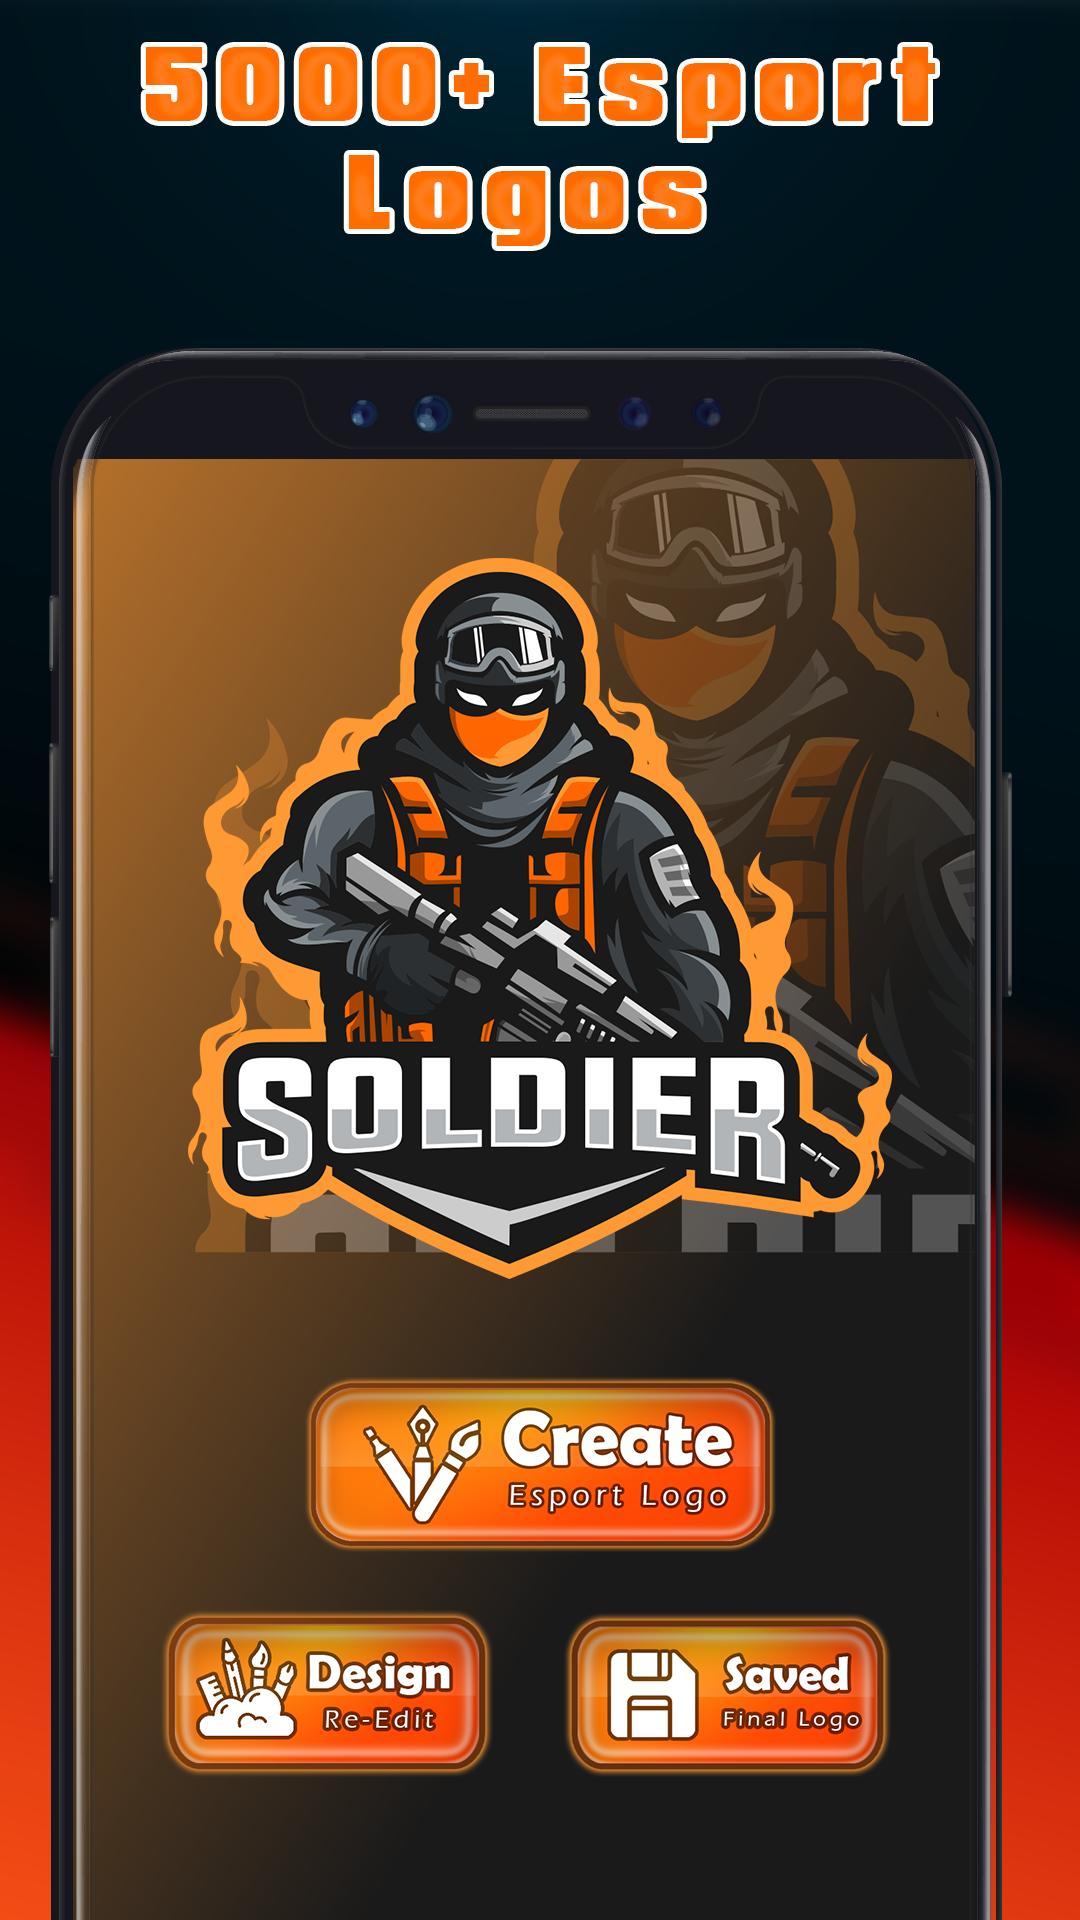 logo esport maker create gaming logo maker free for android apk download logo esport maker create gaming logo